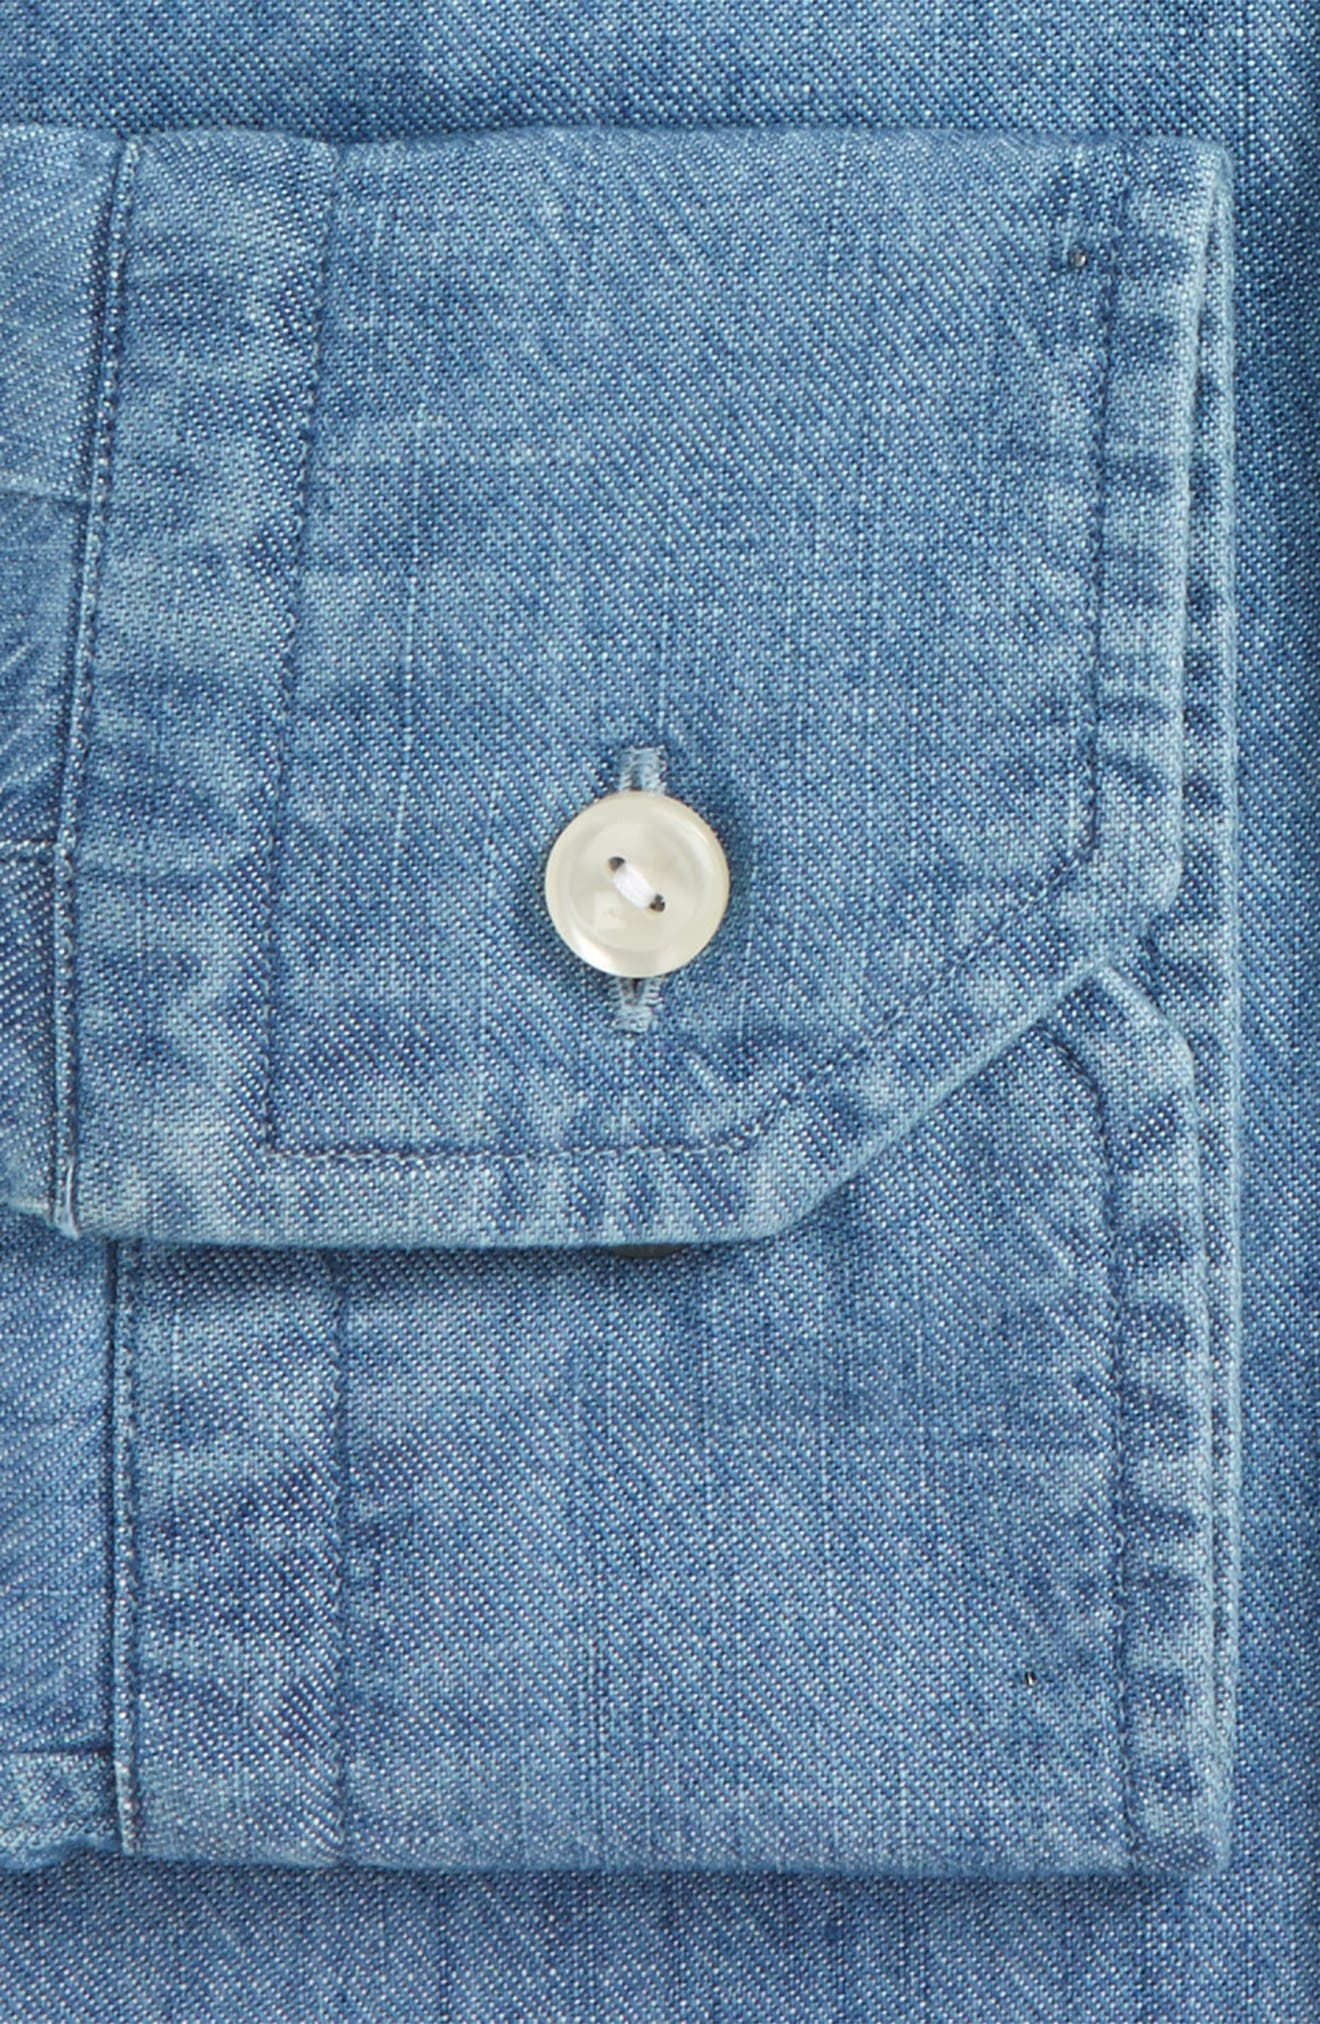 Alternate Image 2  - Eton Slim Fit Chambray Dress Shirt